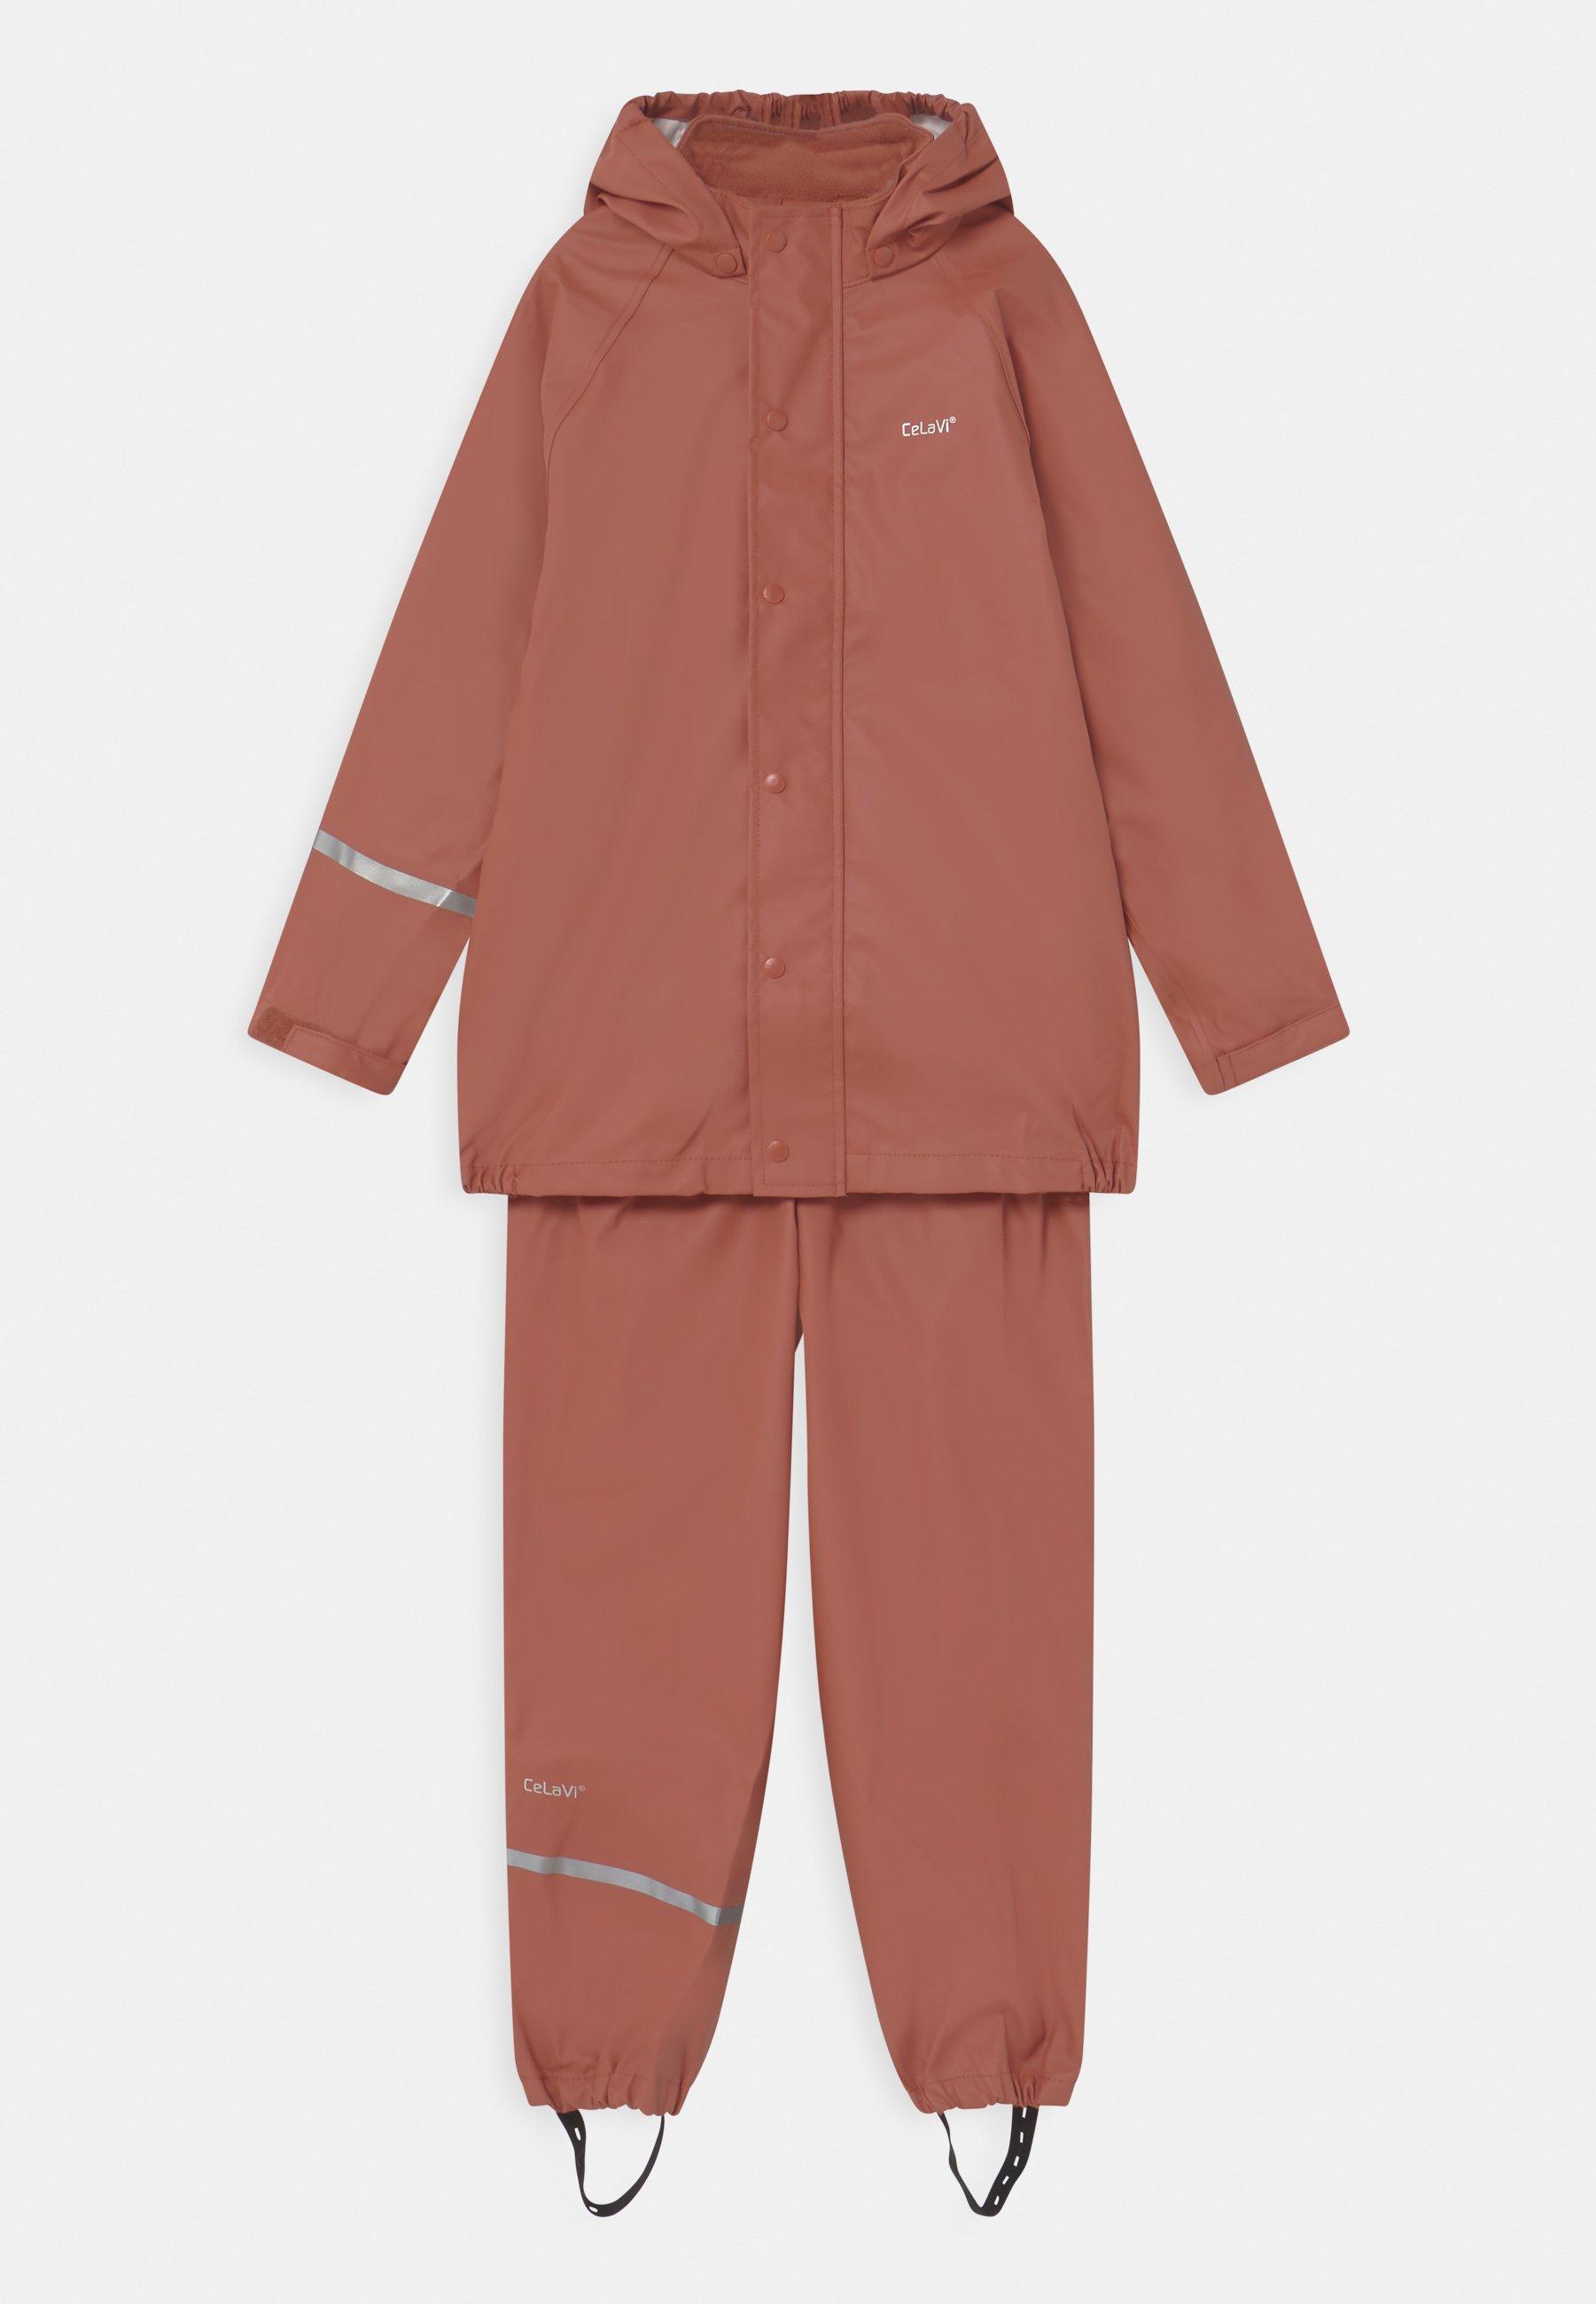 Kinder BASIC RAINWEAR SET UNISEX - Regenjacke / wasserabweisende Jacke